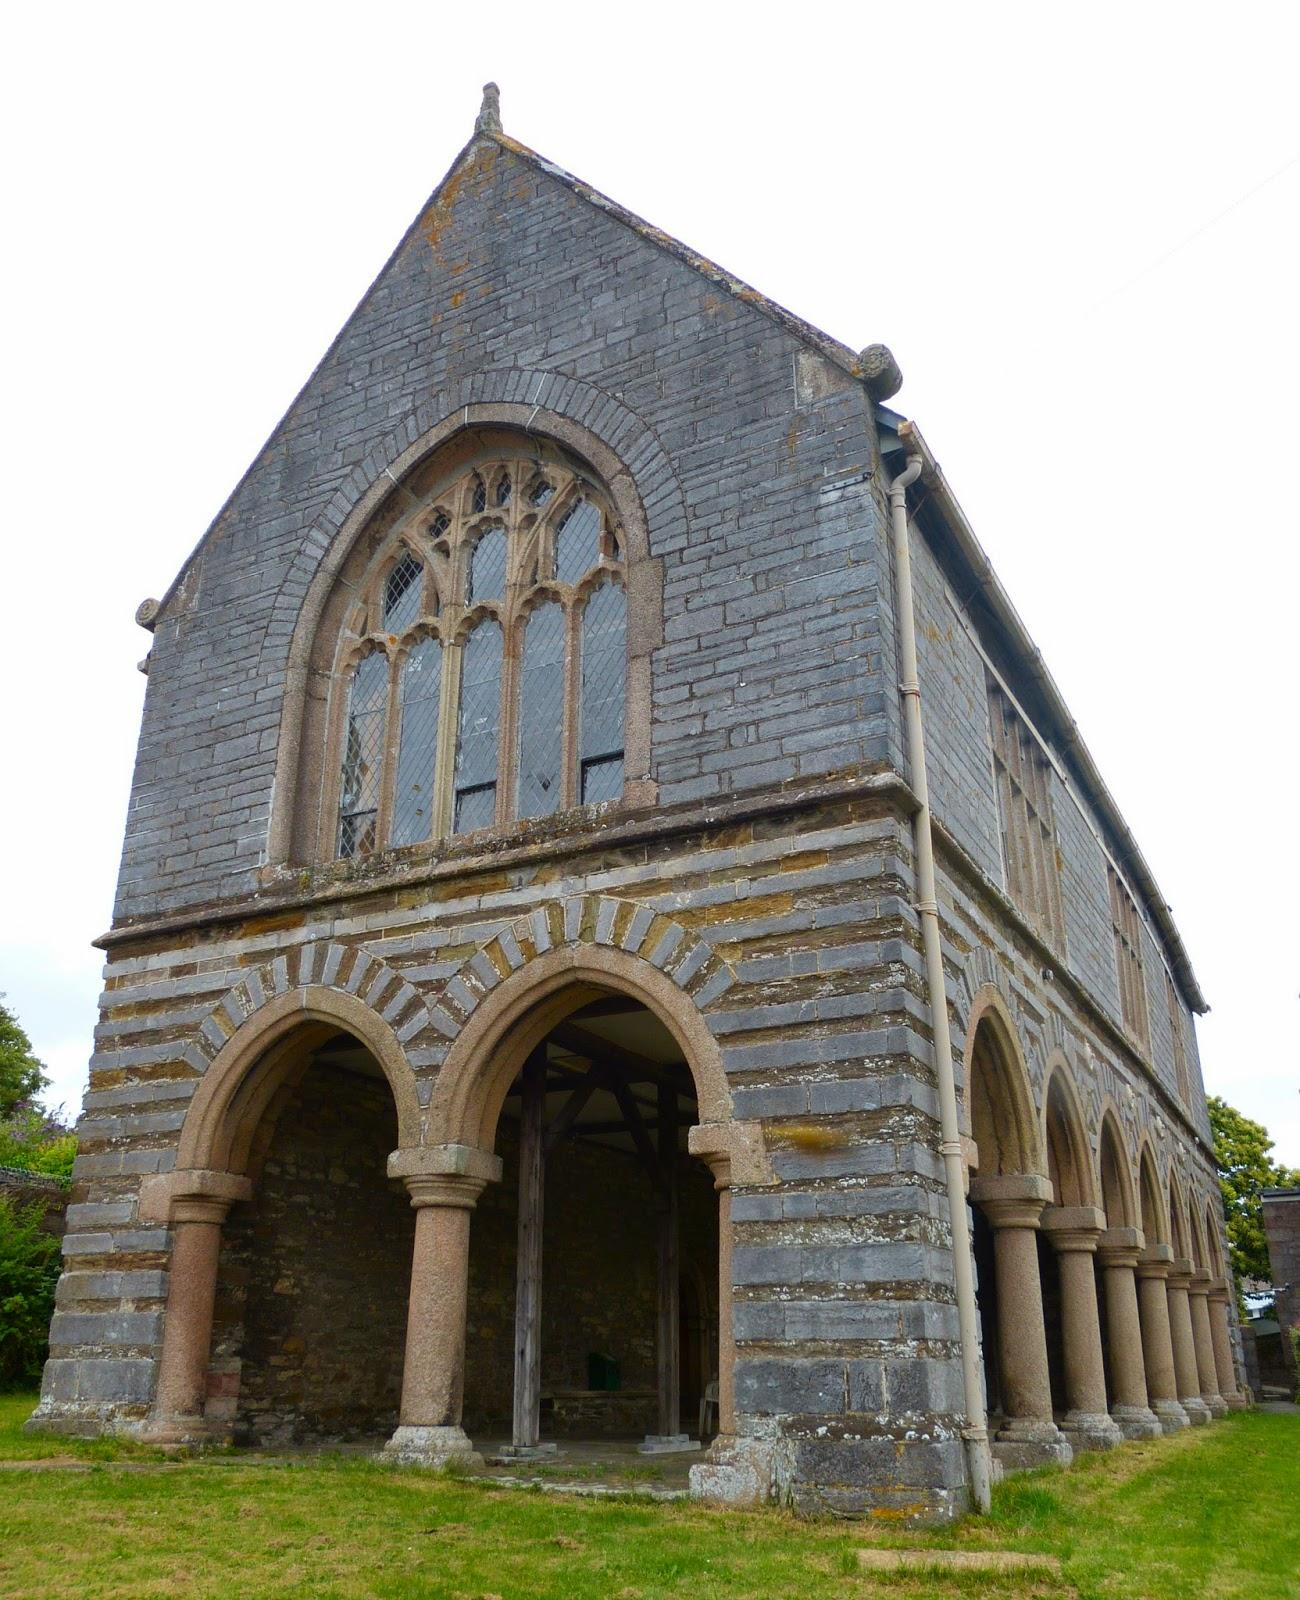 Plymton Grammar School, Plympton, Devon